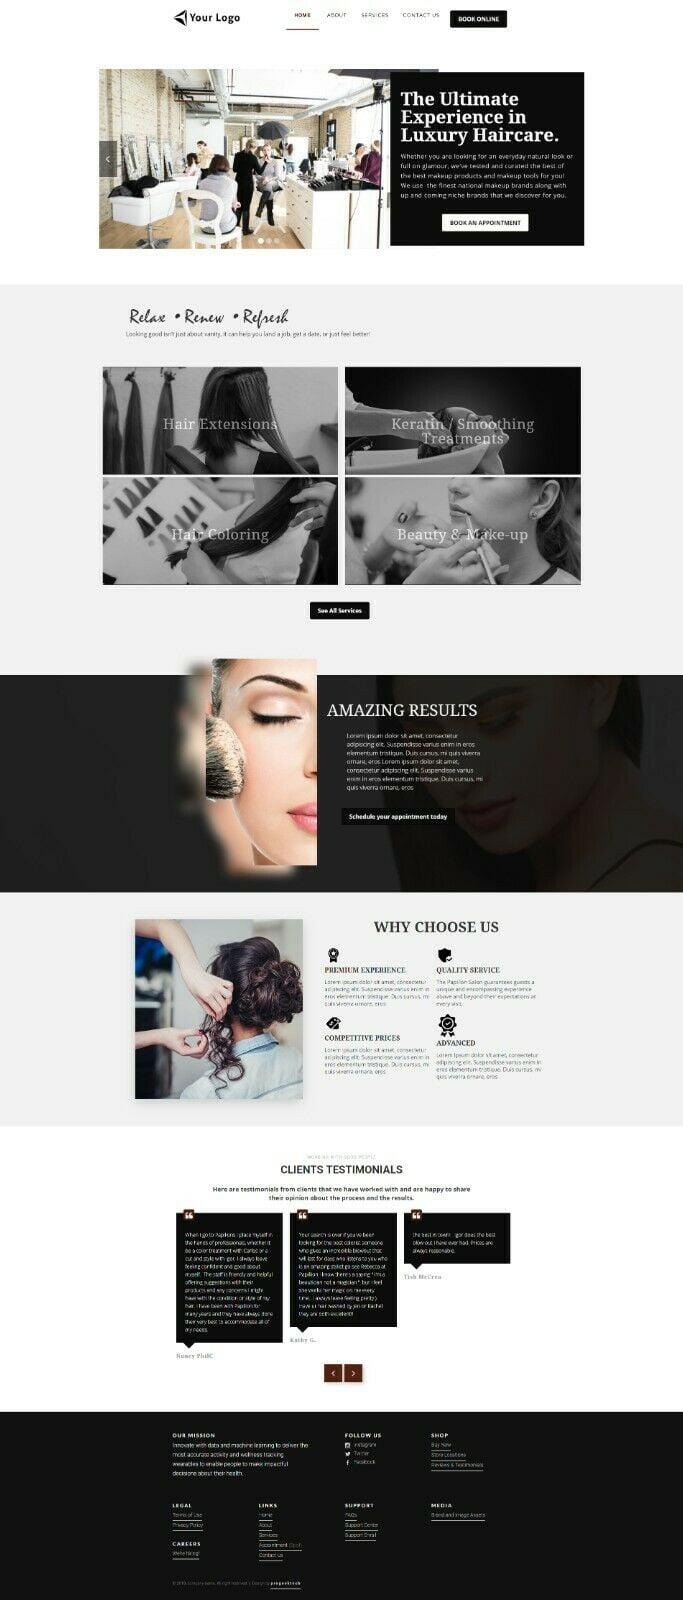 Beauty Salon , Skin Care, Waxing, Massage Professional Website